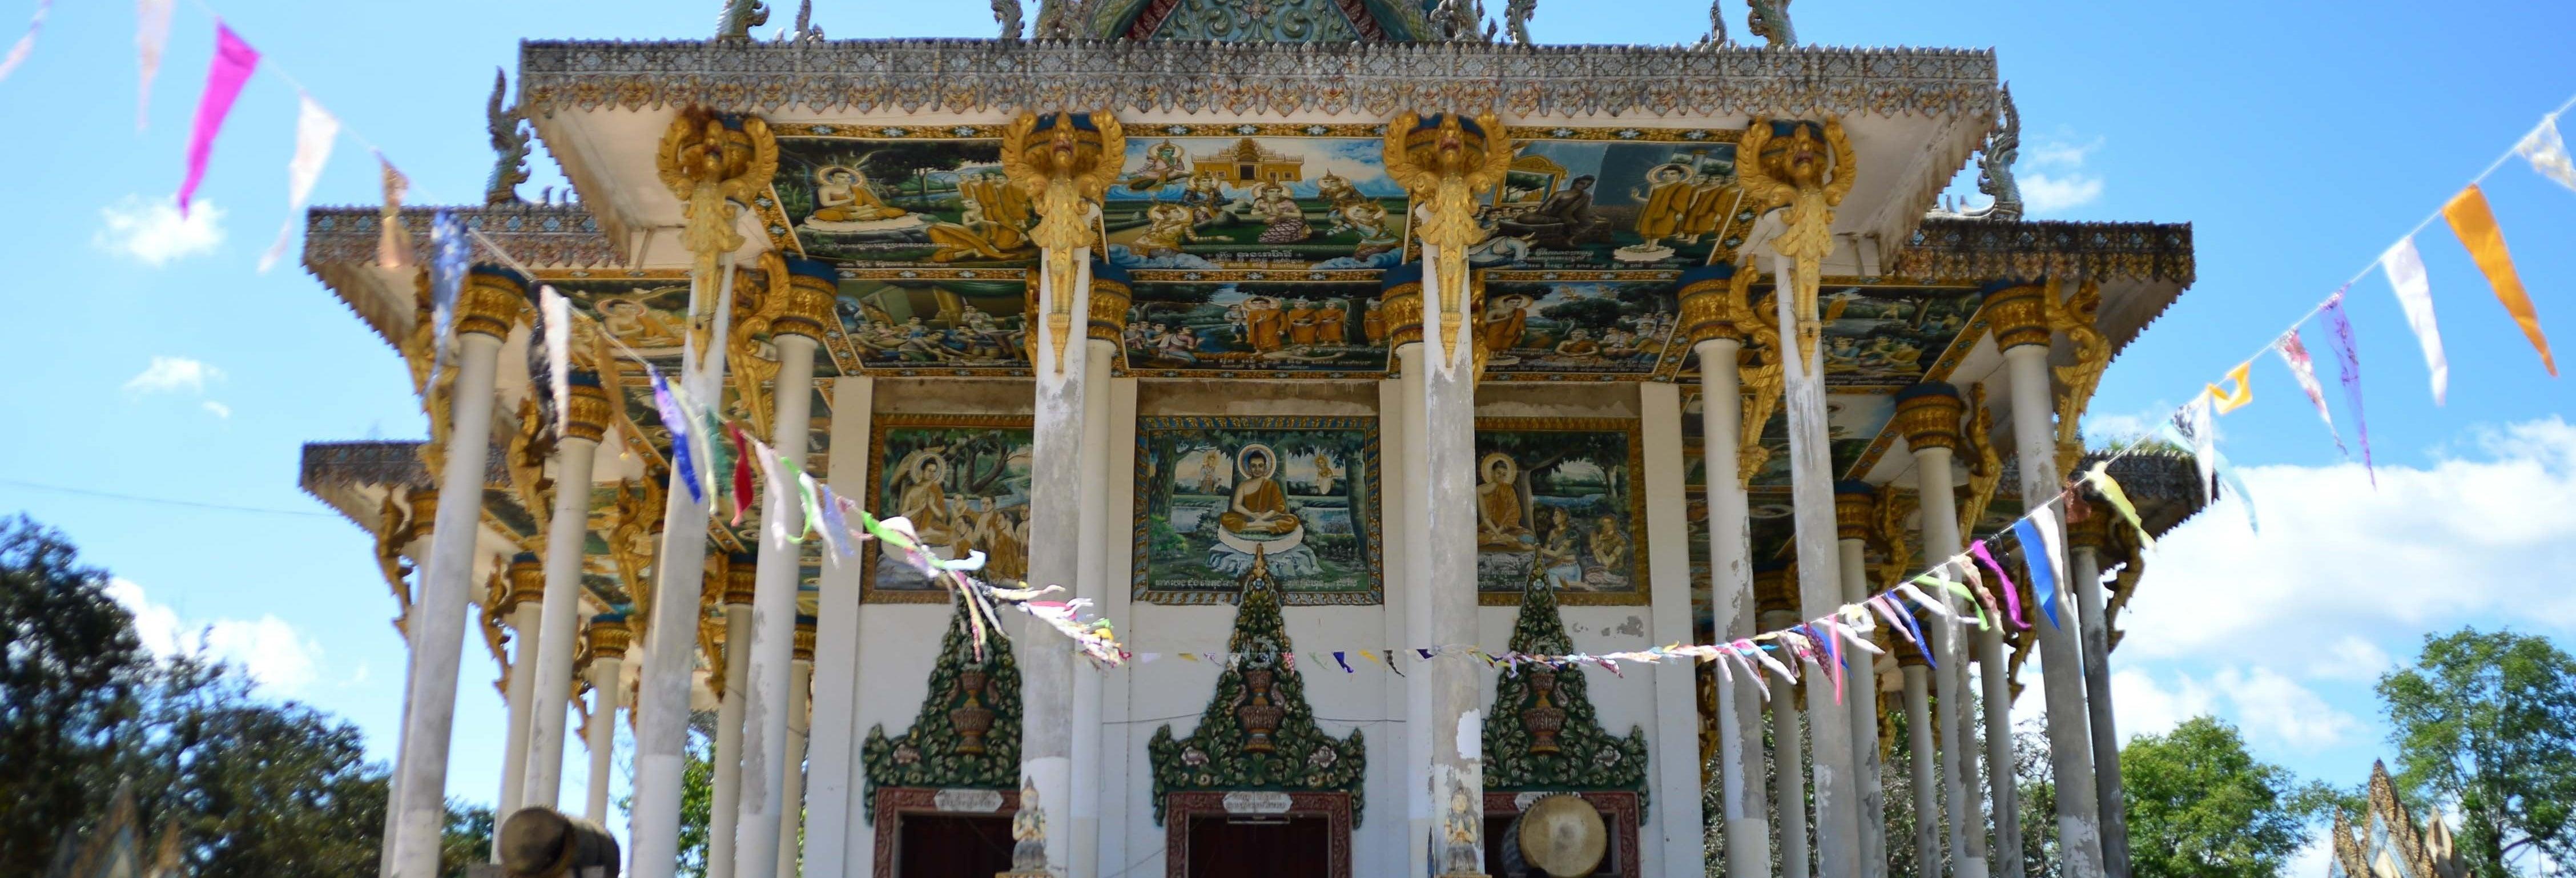 Private Tour of Battambang